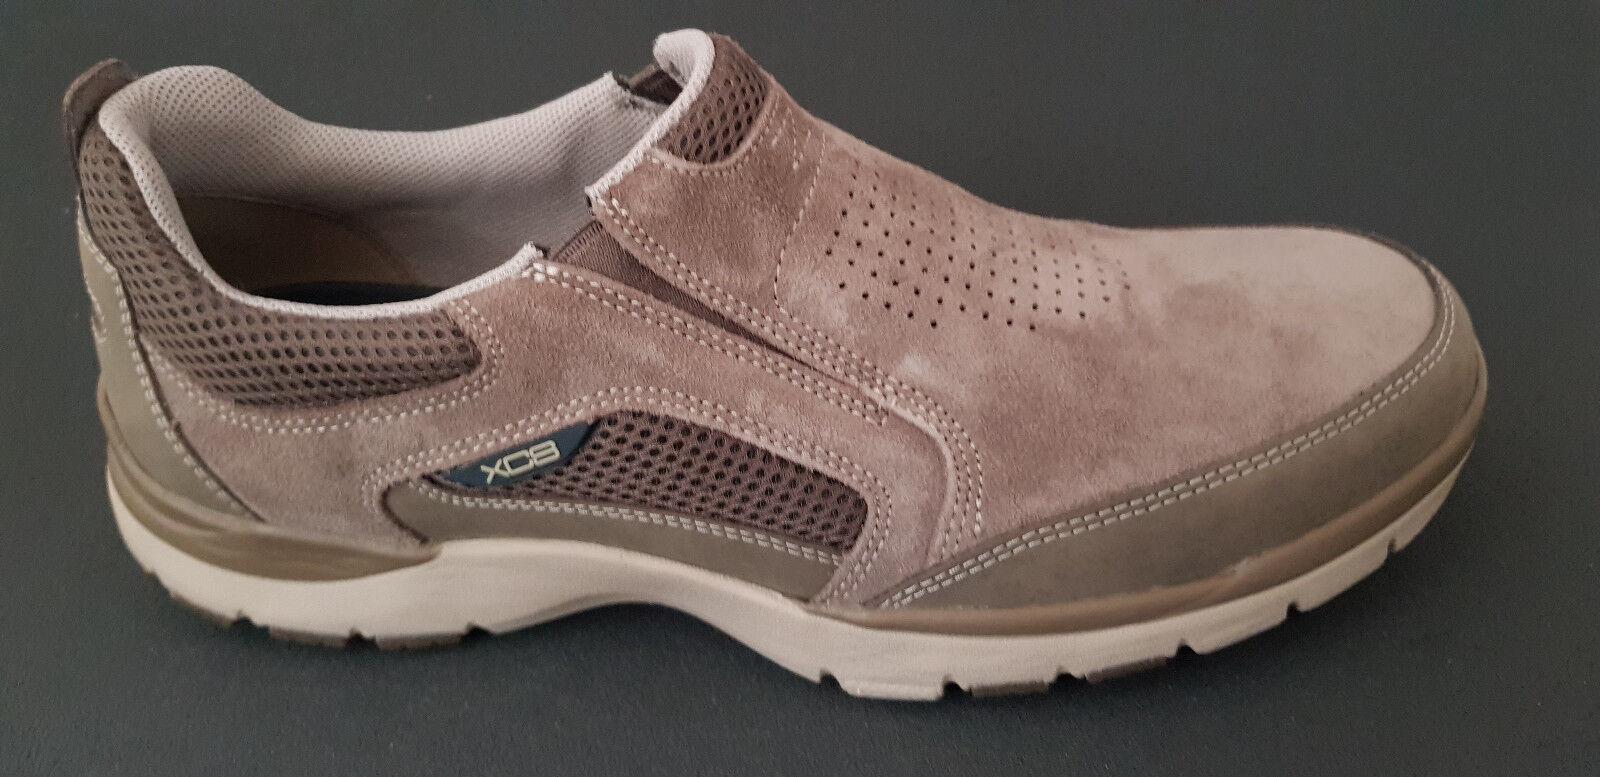 Rockport mocasines señores sneakers loafer Comfort mocasines Rockport zapatos nuevo Stone d41f2f